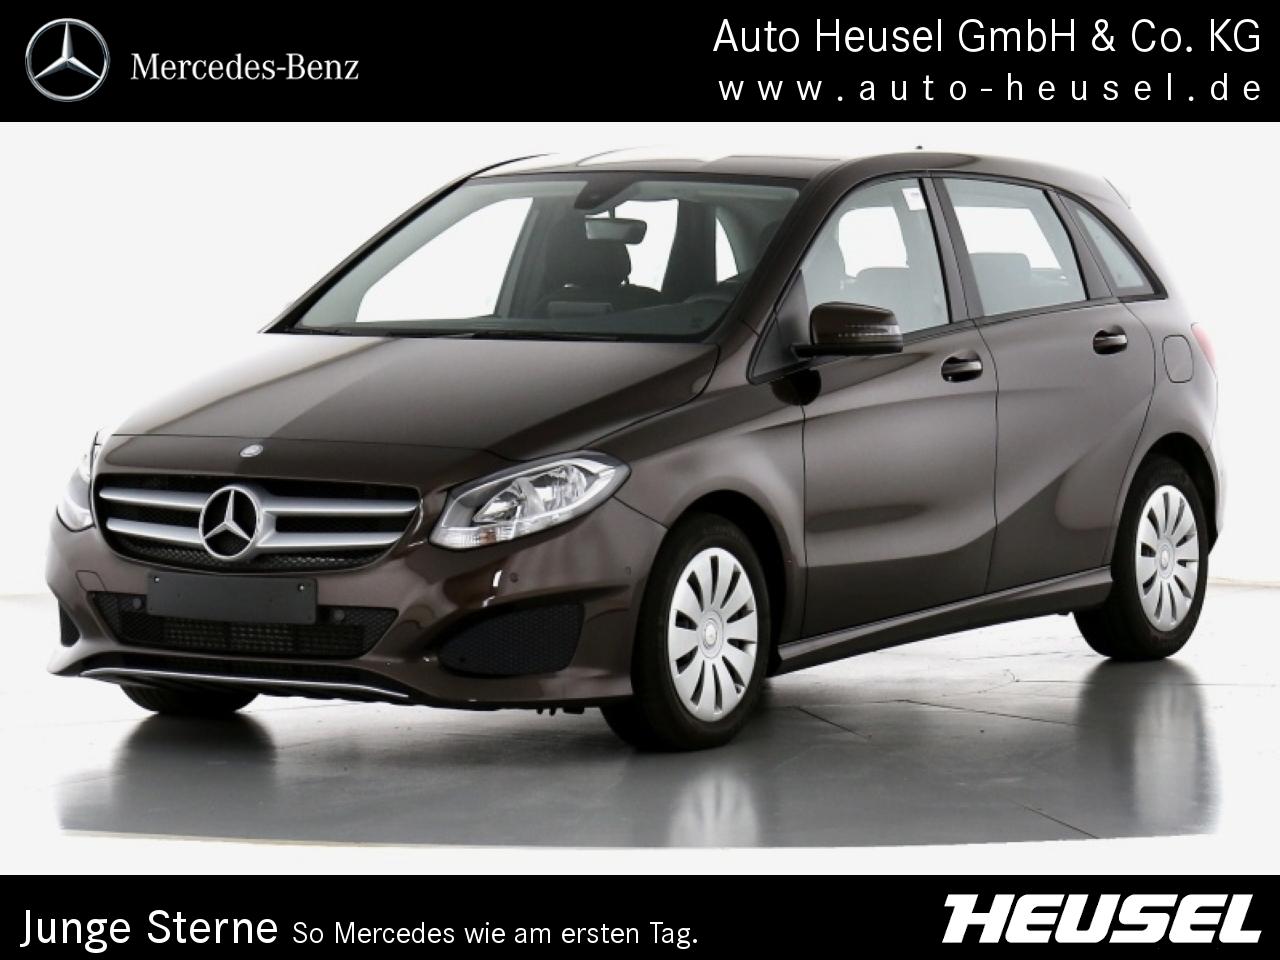 Mercedes-Benz B 220 d *Kamera*SHZ*Navi*Parkpilot*Bremsassist.*, Jahr 2016, Diesel